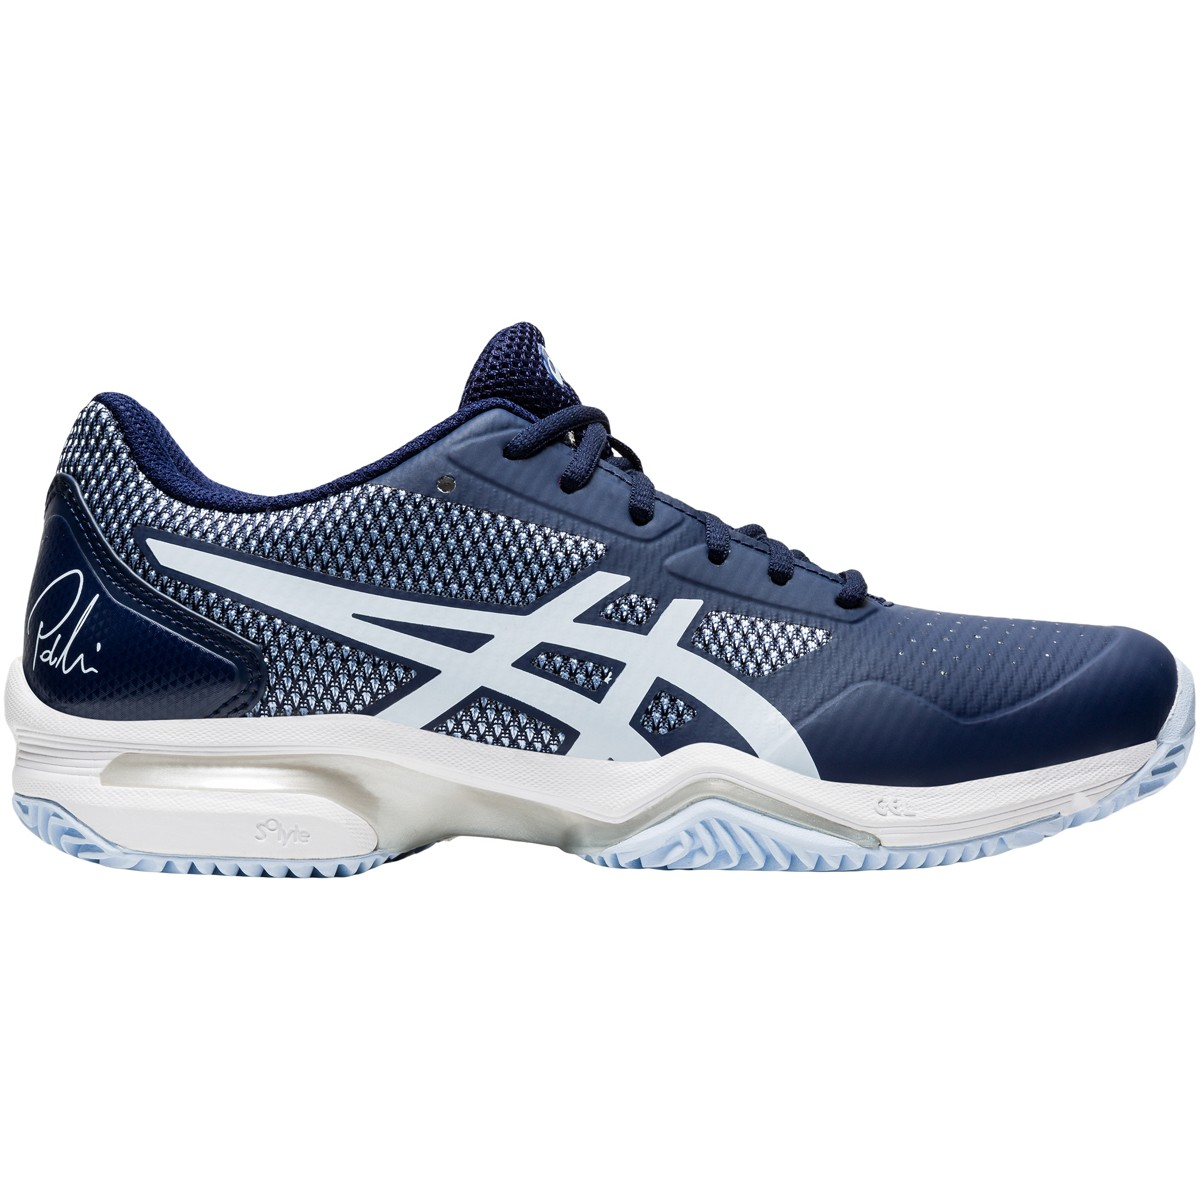 WOMEN'S ASICS GEL LIMA PADEL/CLAY COURT SHOES - ASICS - Shoes ...